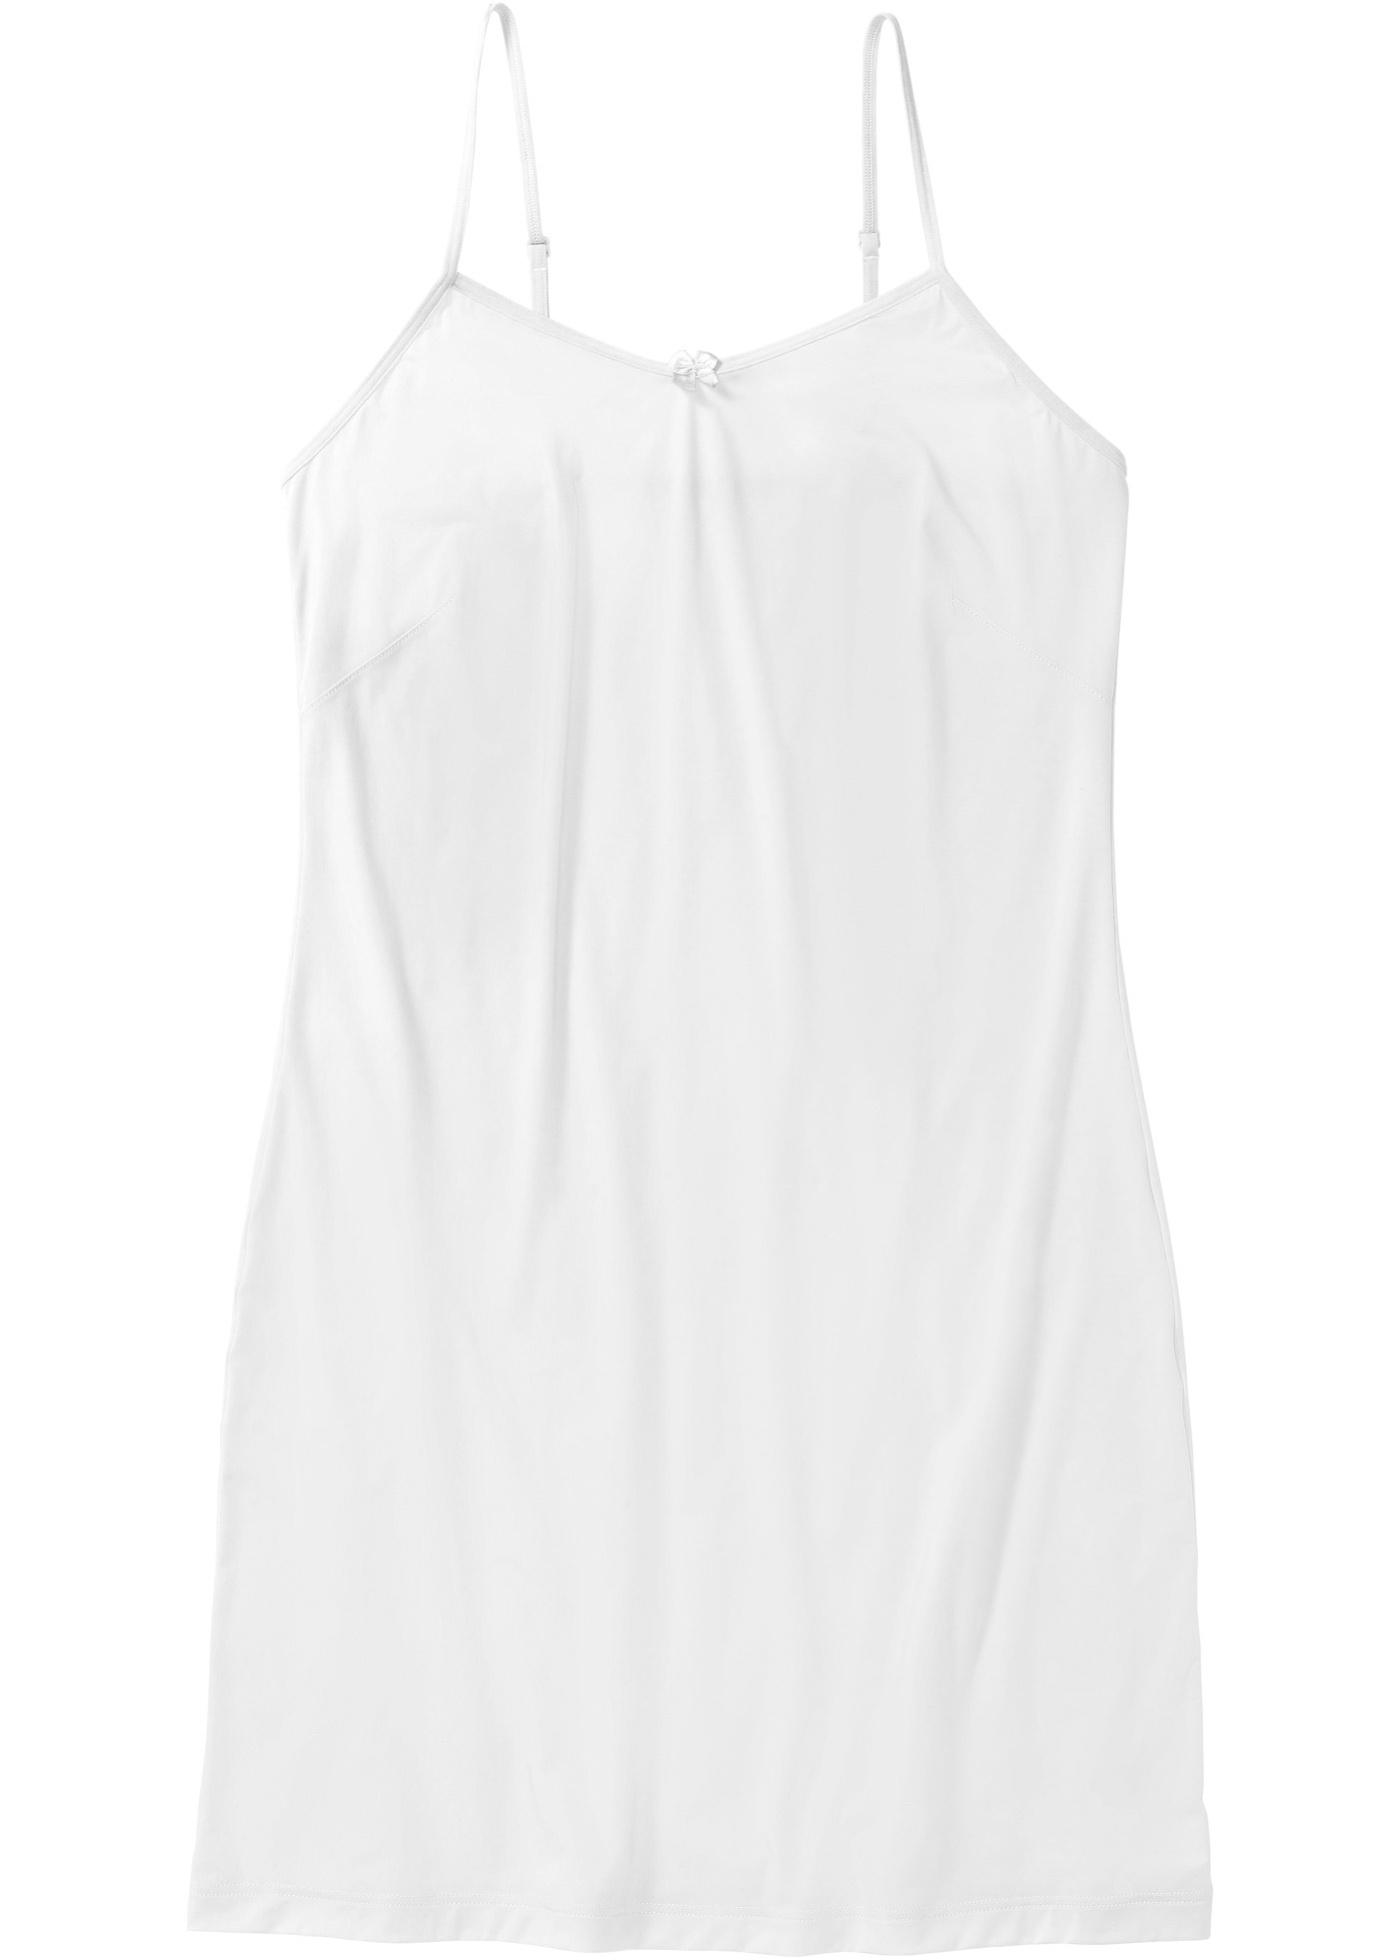 Sottoveste (Bianco) - bpc bonprix collection - Nice Size